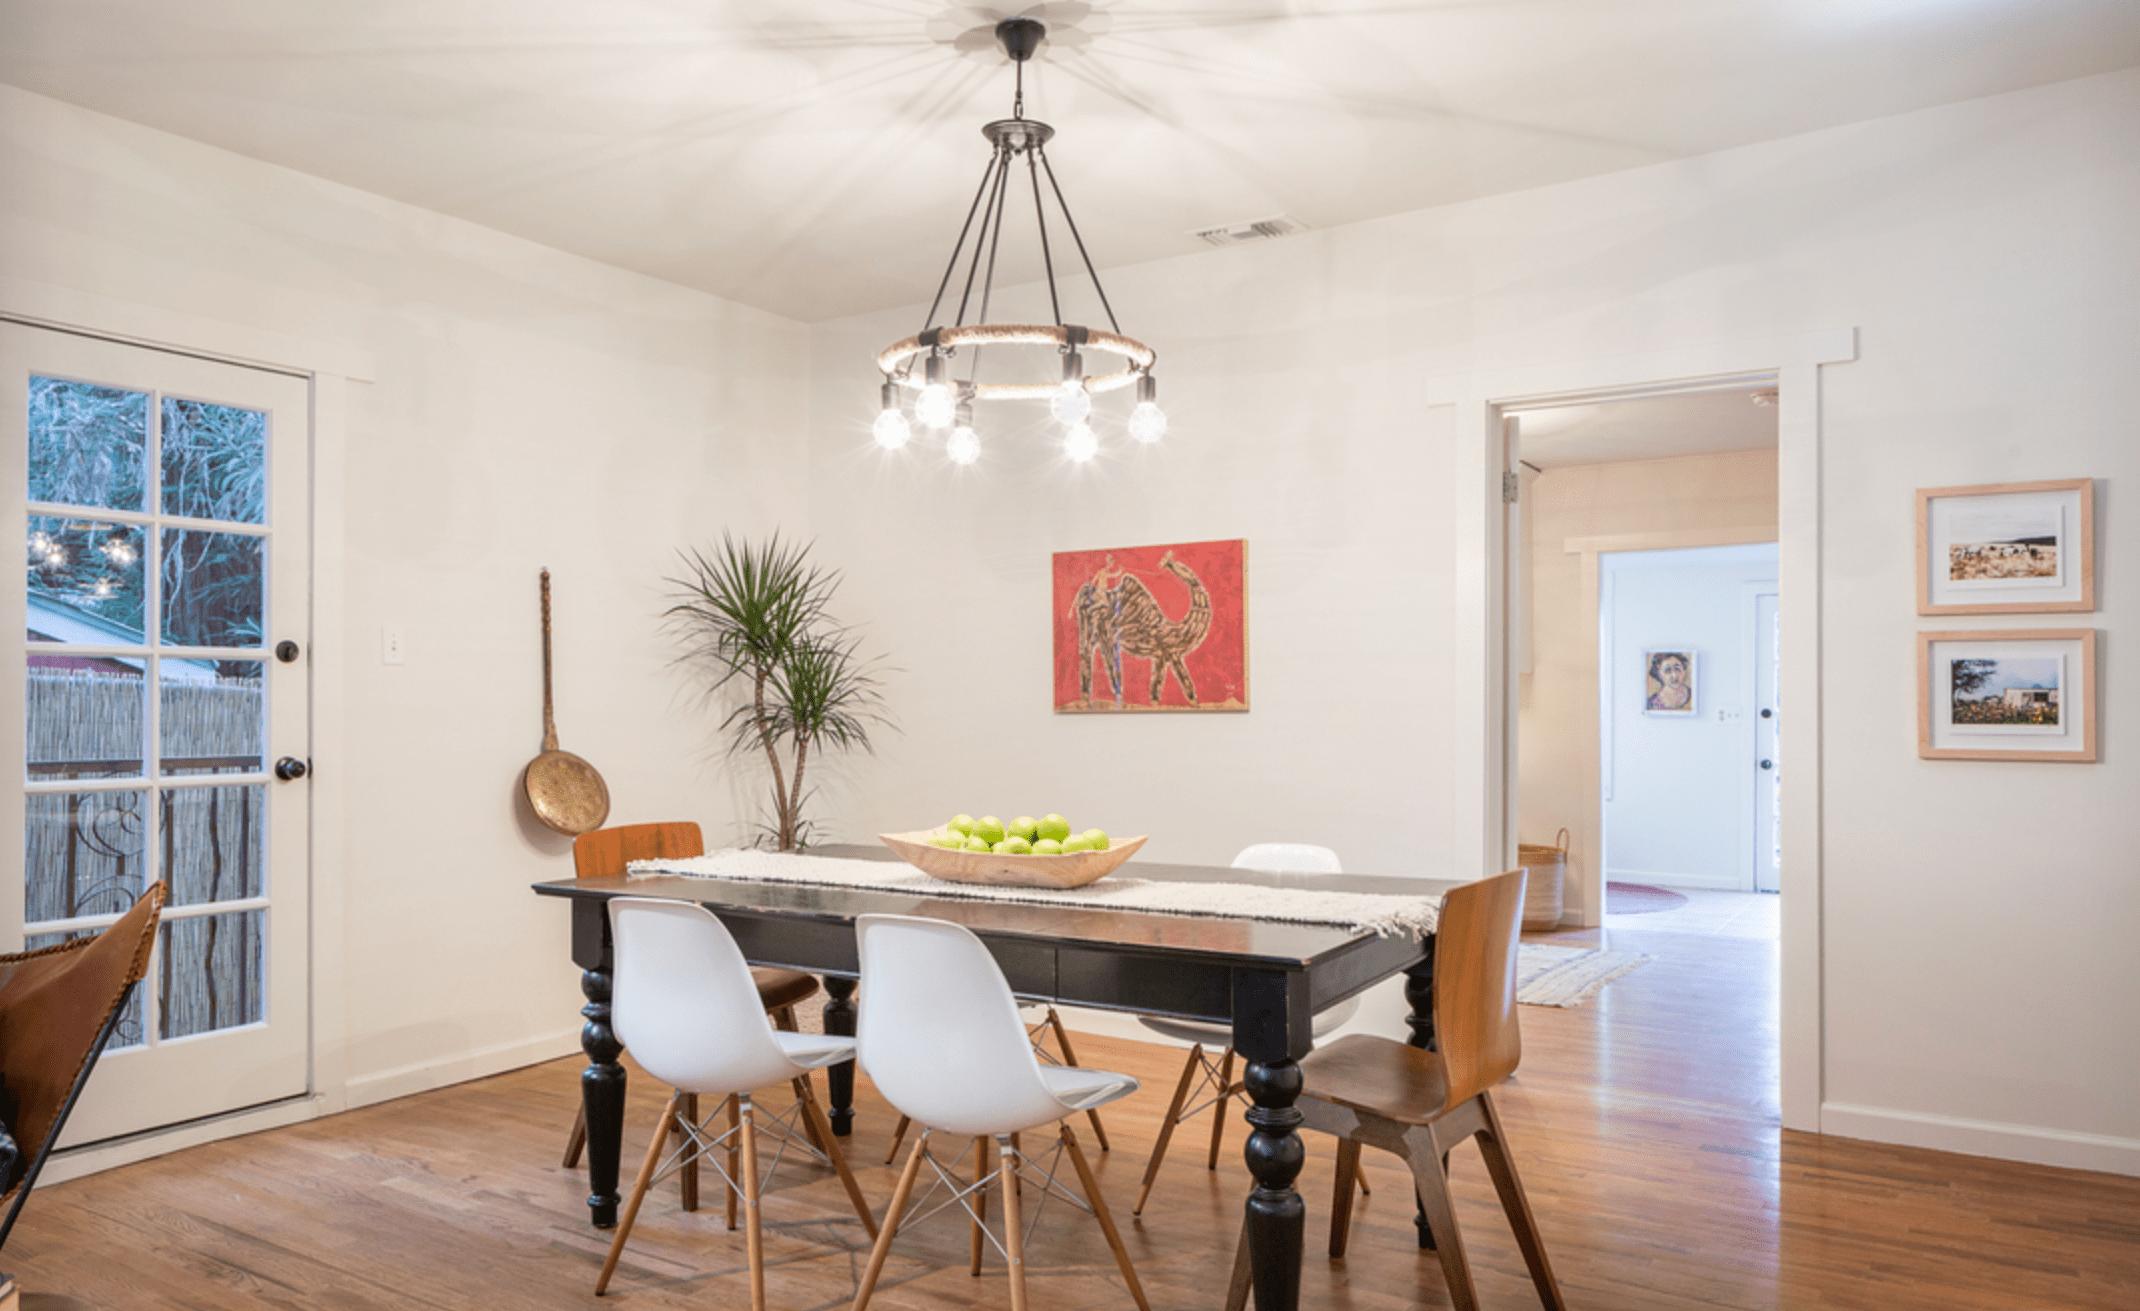 3623 Latrobe St., Los Angeles, CA 90031 Dining Room